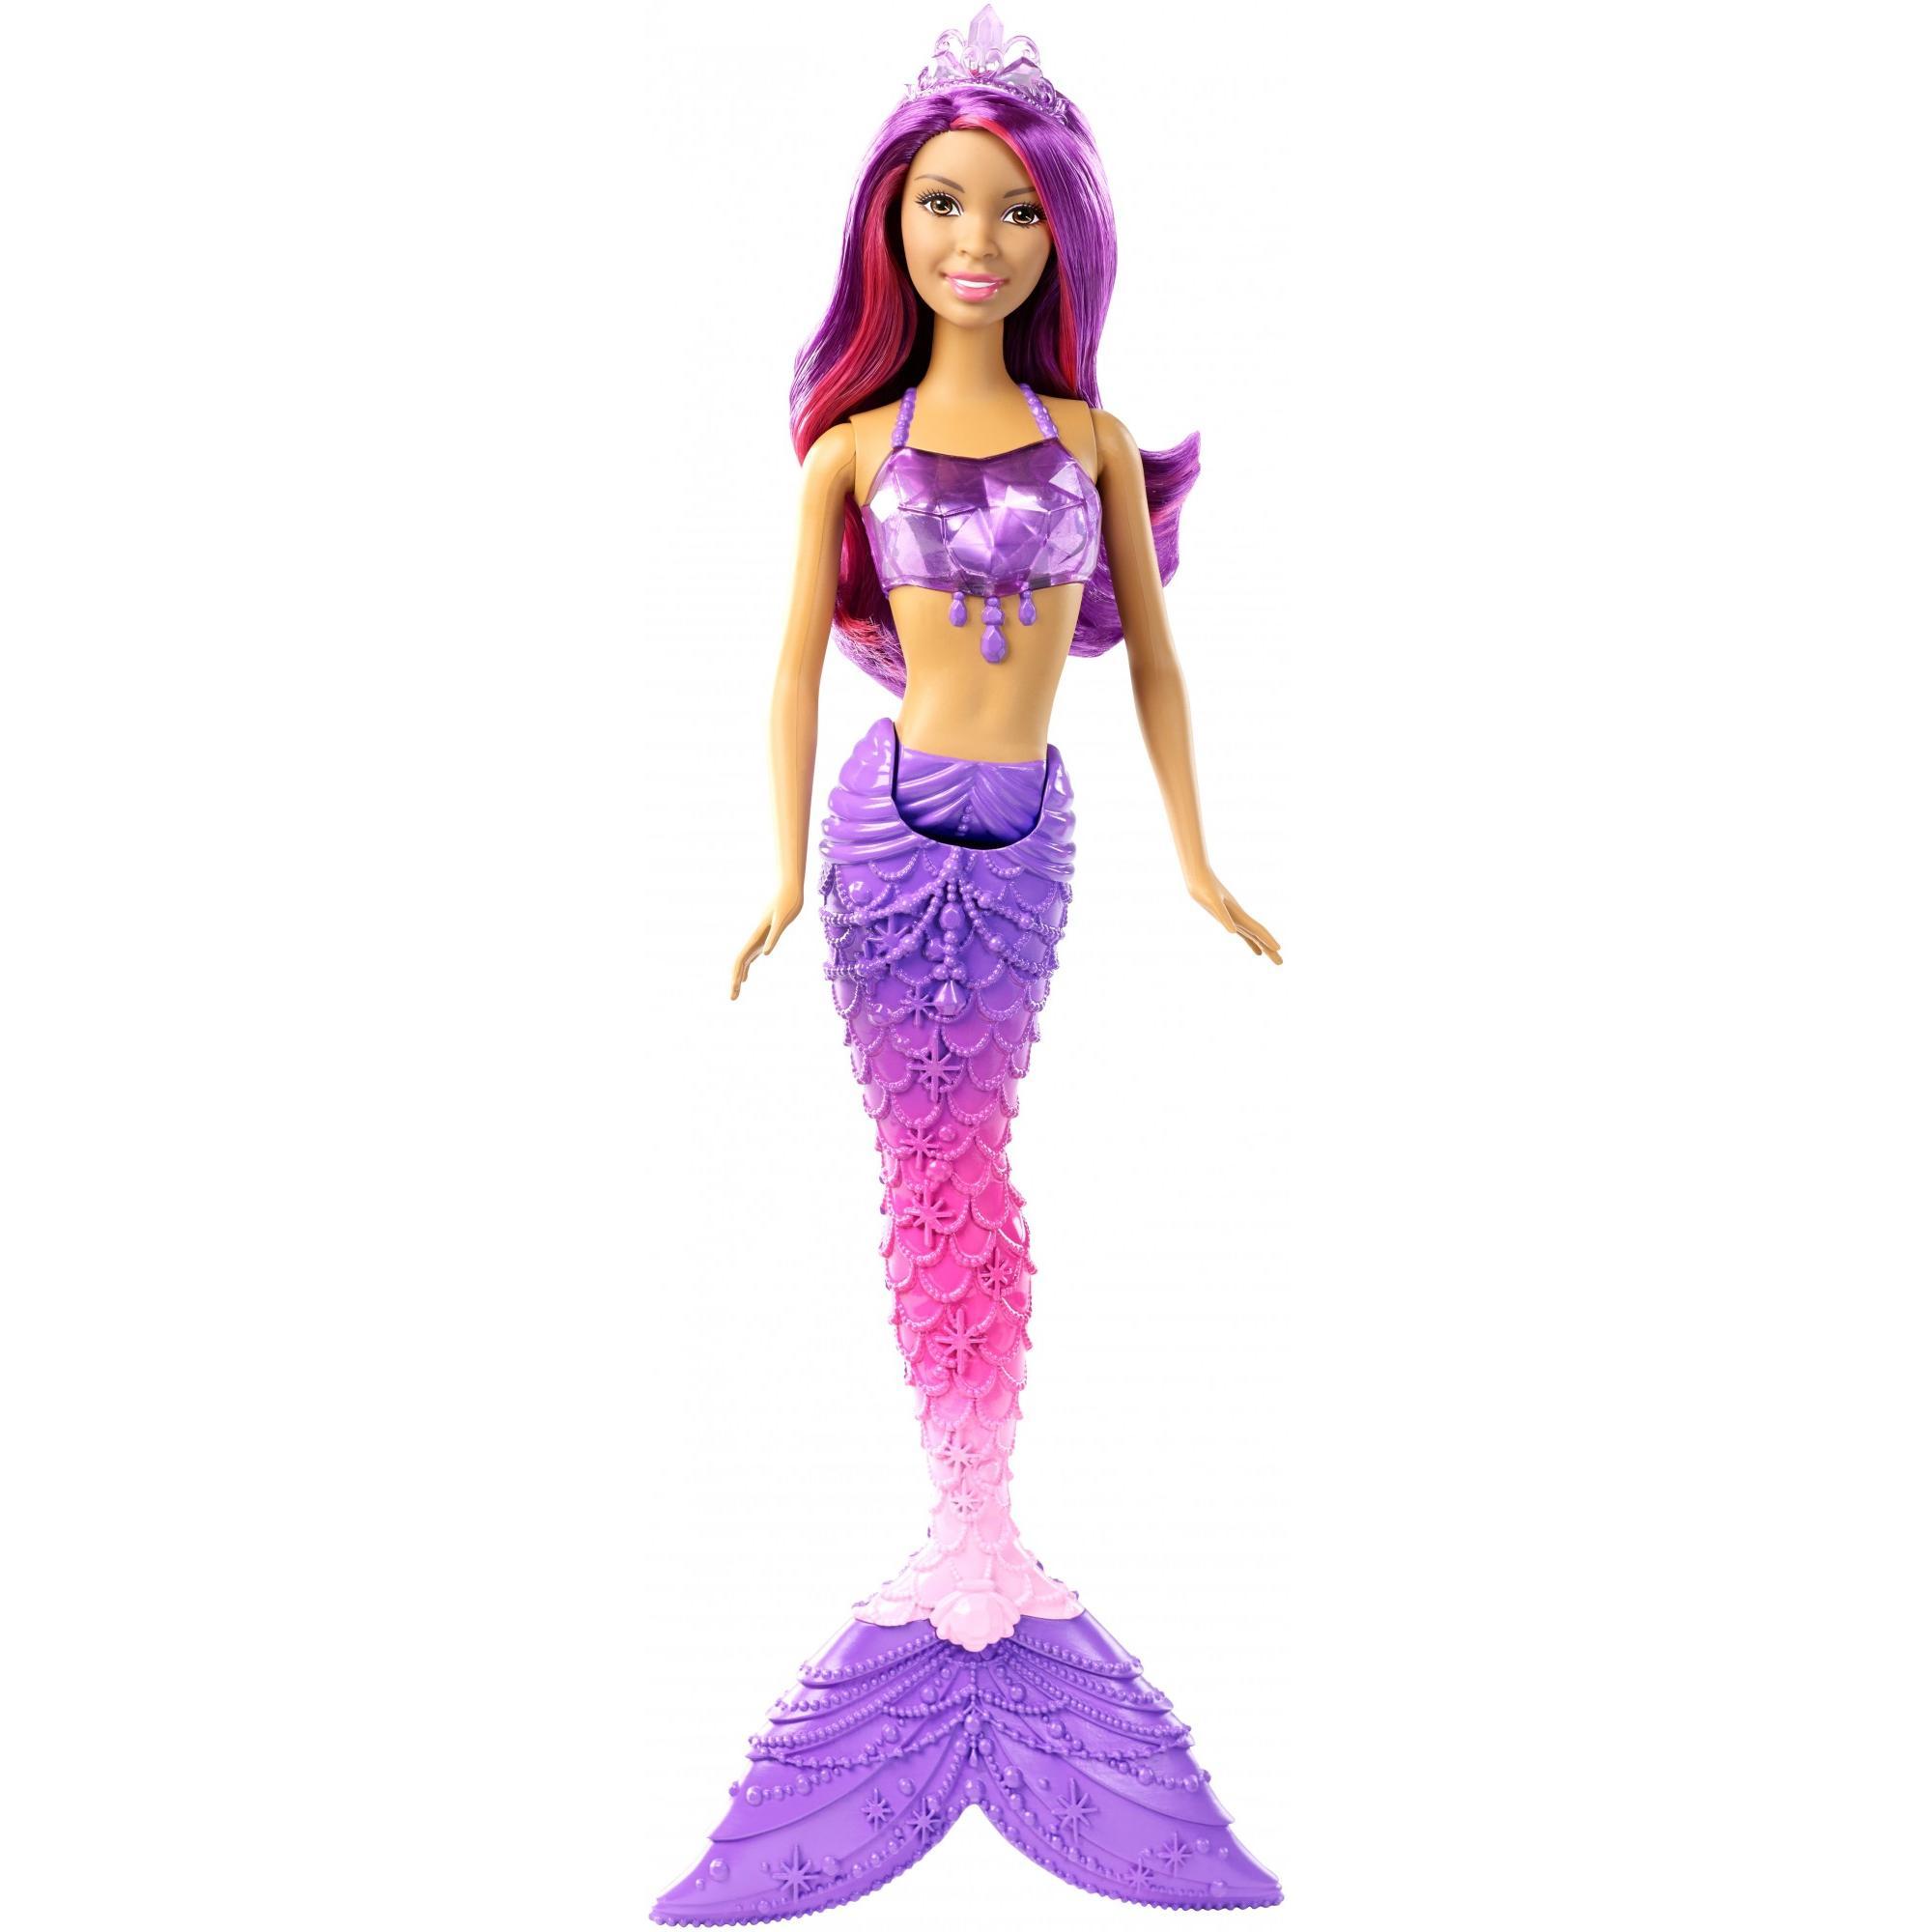 Barbie Mermaid Doll, Gem Fashion - Nikki - Walmart.com